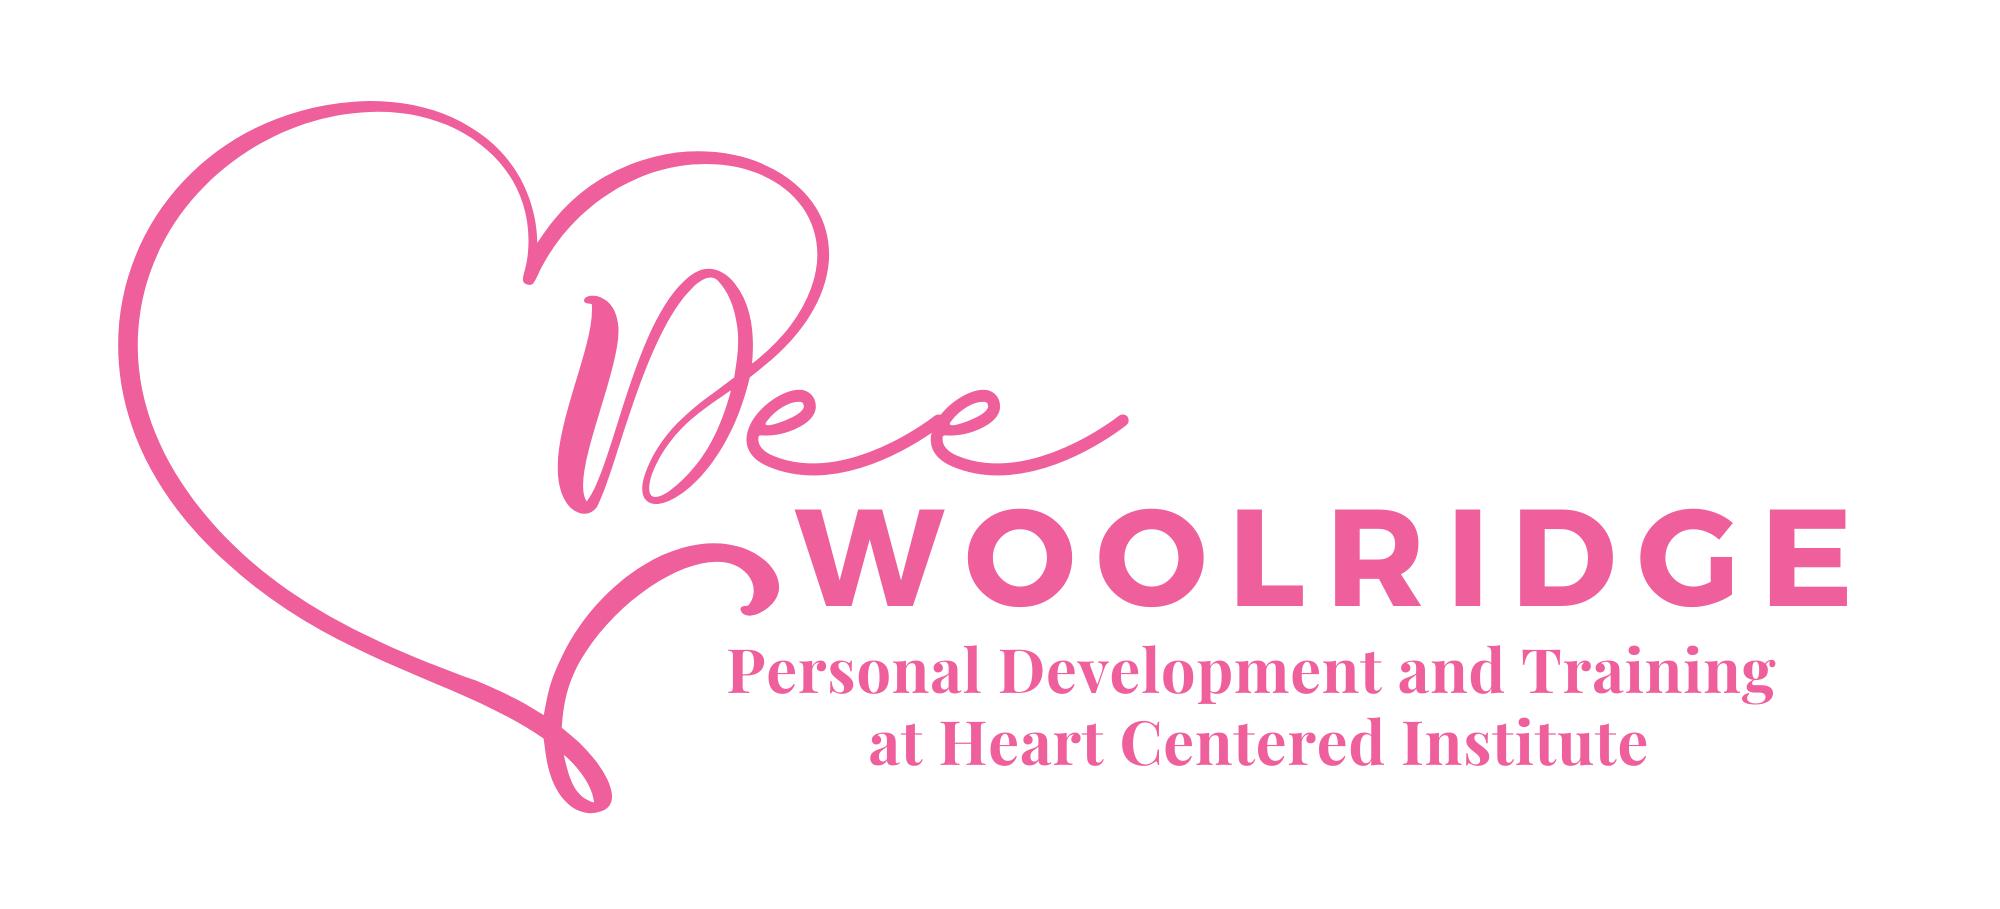 Dee Woolridge - Heart Centered Institute logo